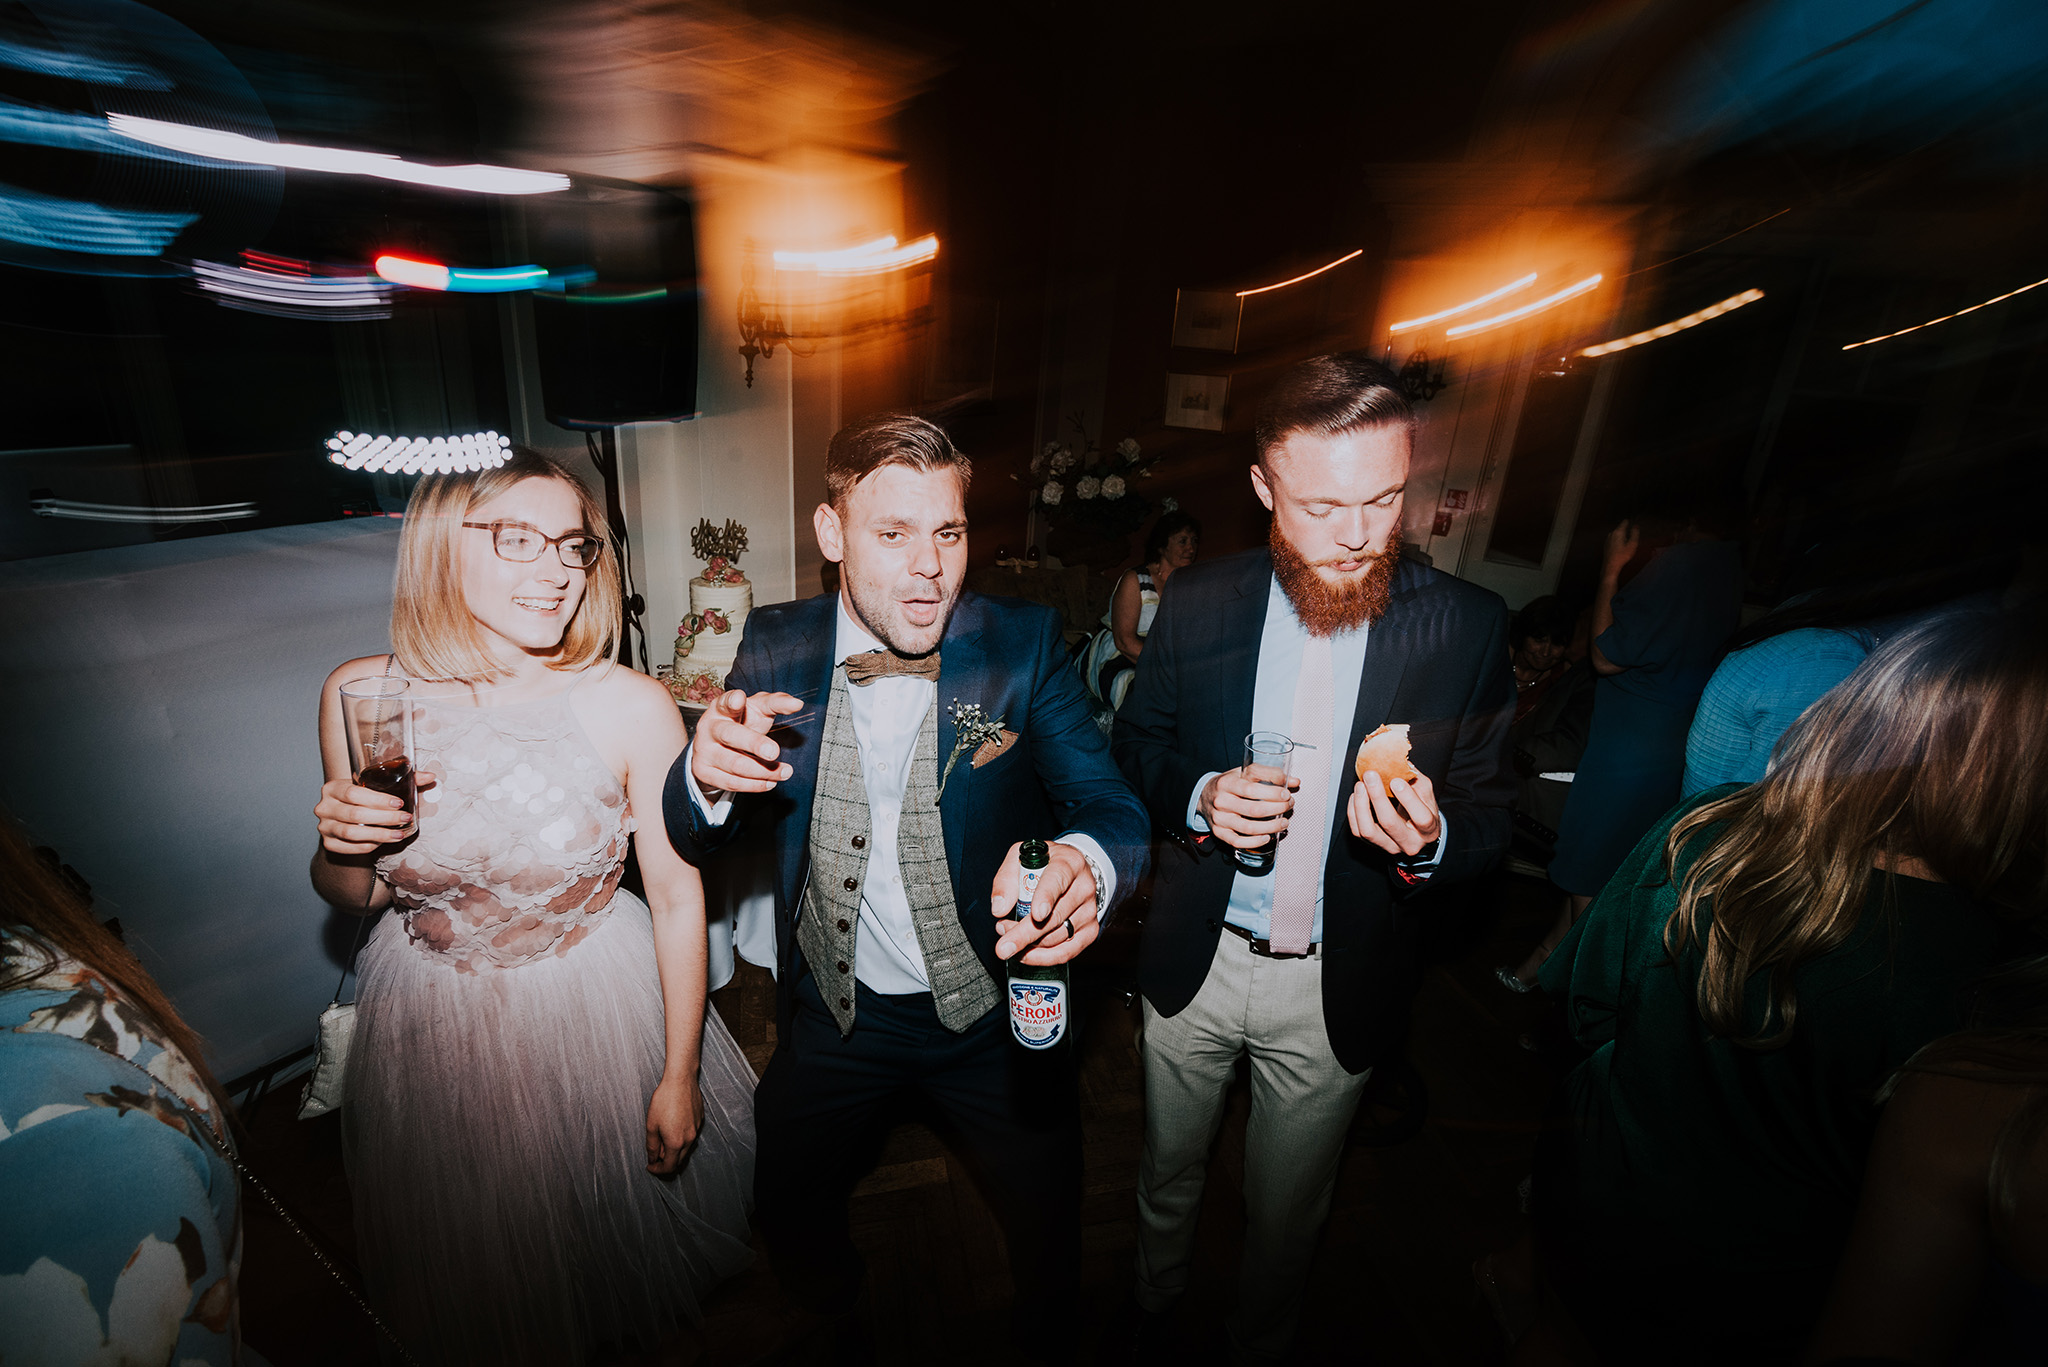 scott-stockwell-photography-wedding-006.jpg